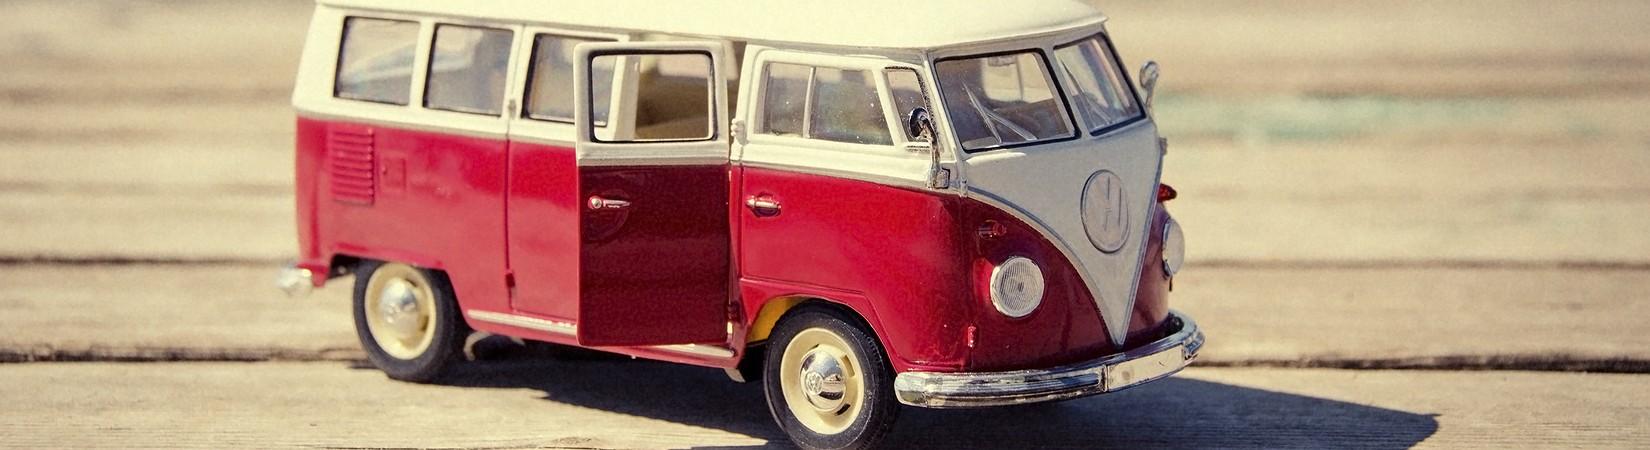 VW confirmed the $256 million Navistar's stock purchase